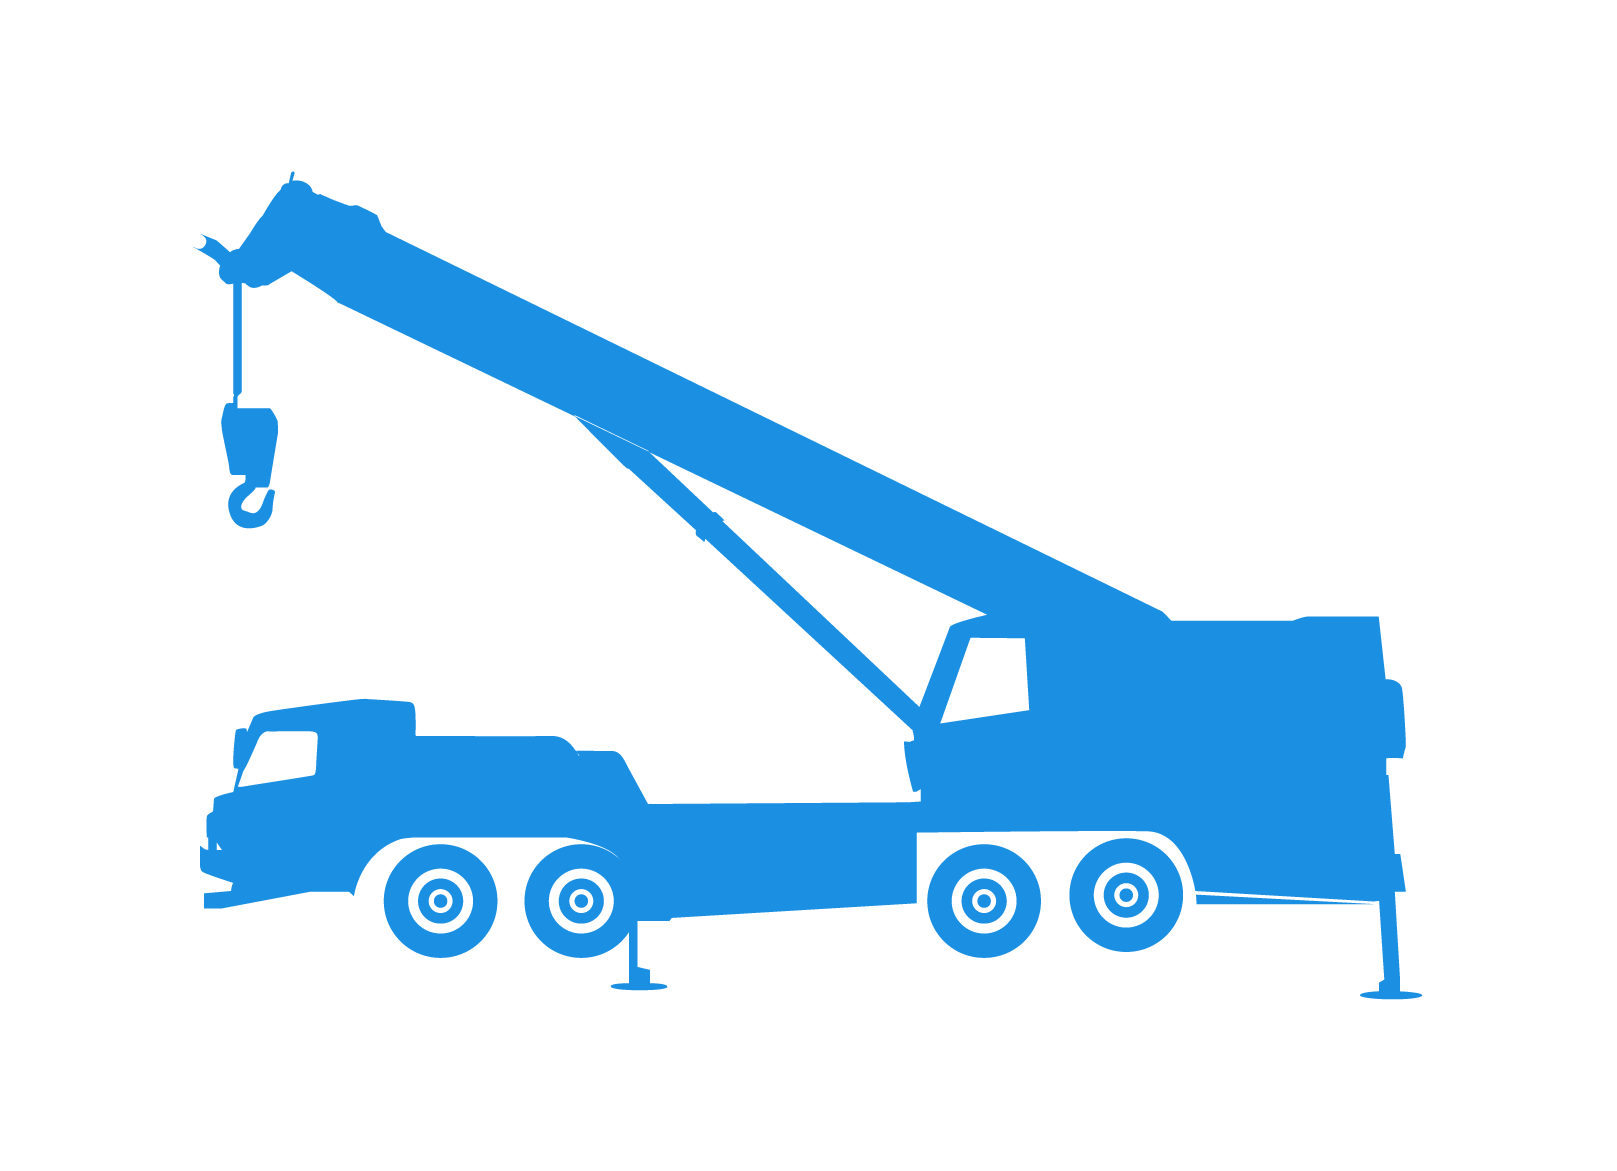 Crane clipart hydraulic crane. Mobile insurance adrian flux